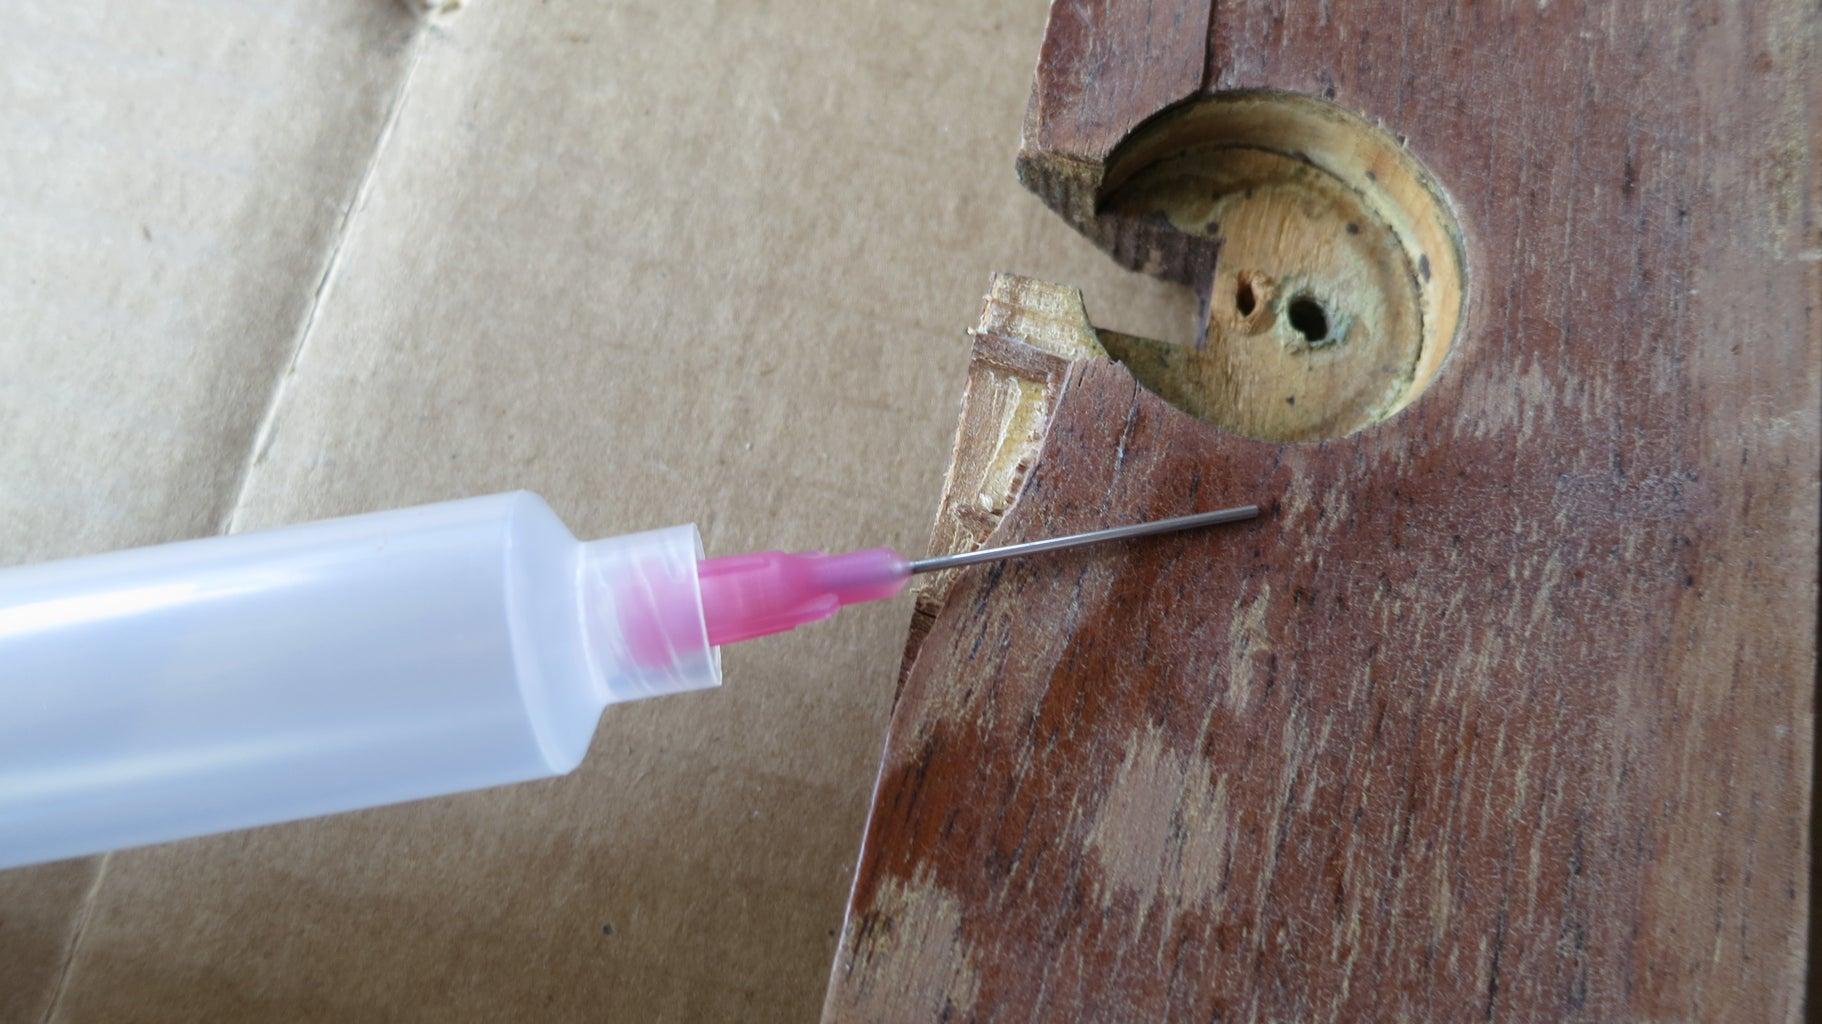 Glue Veneer With a Syringe